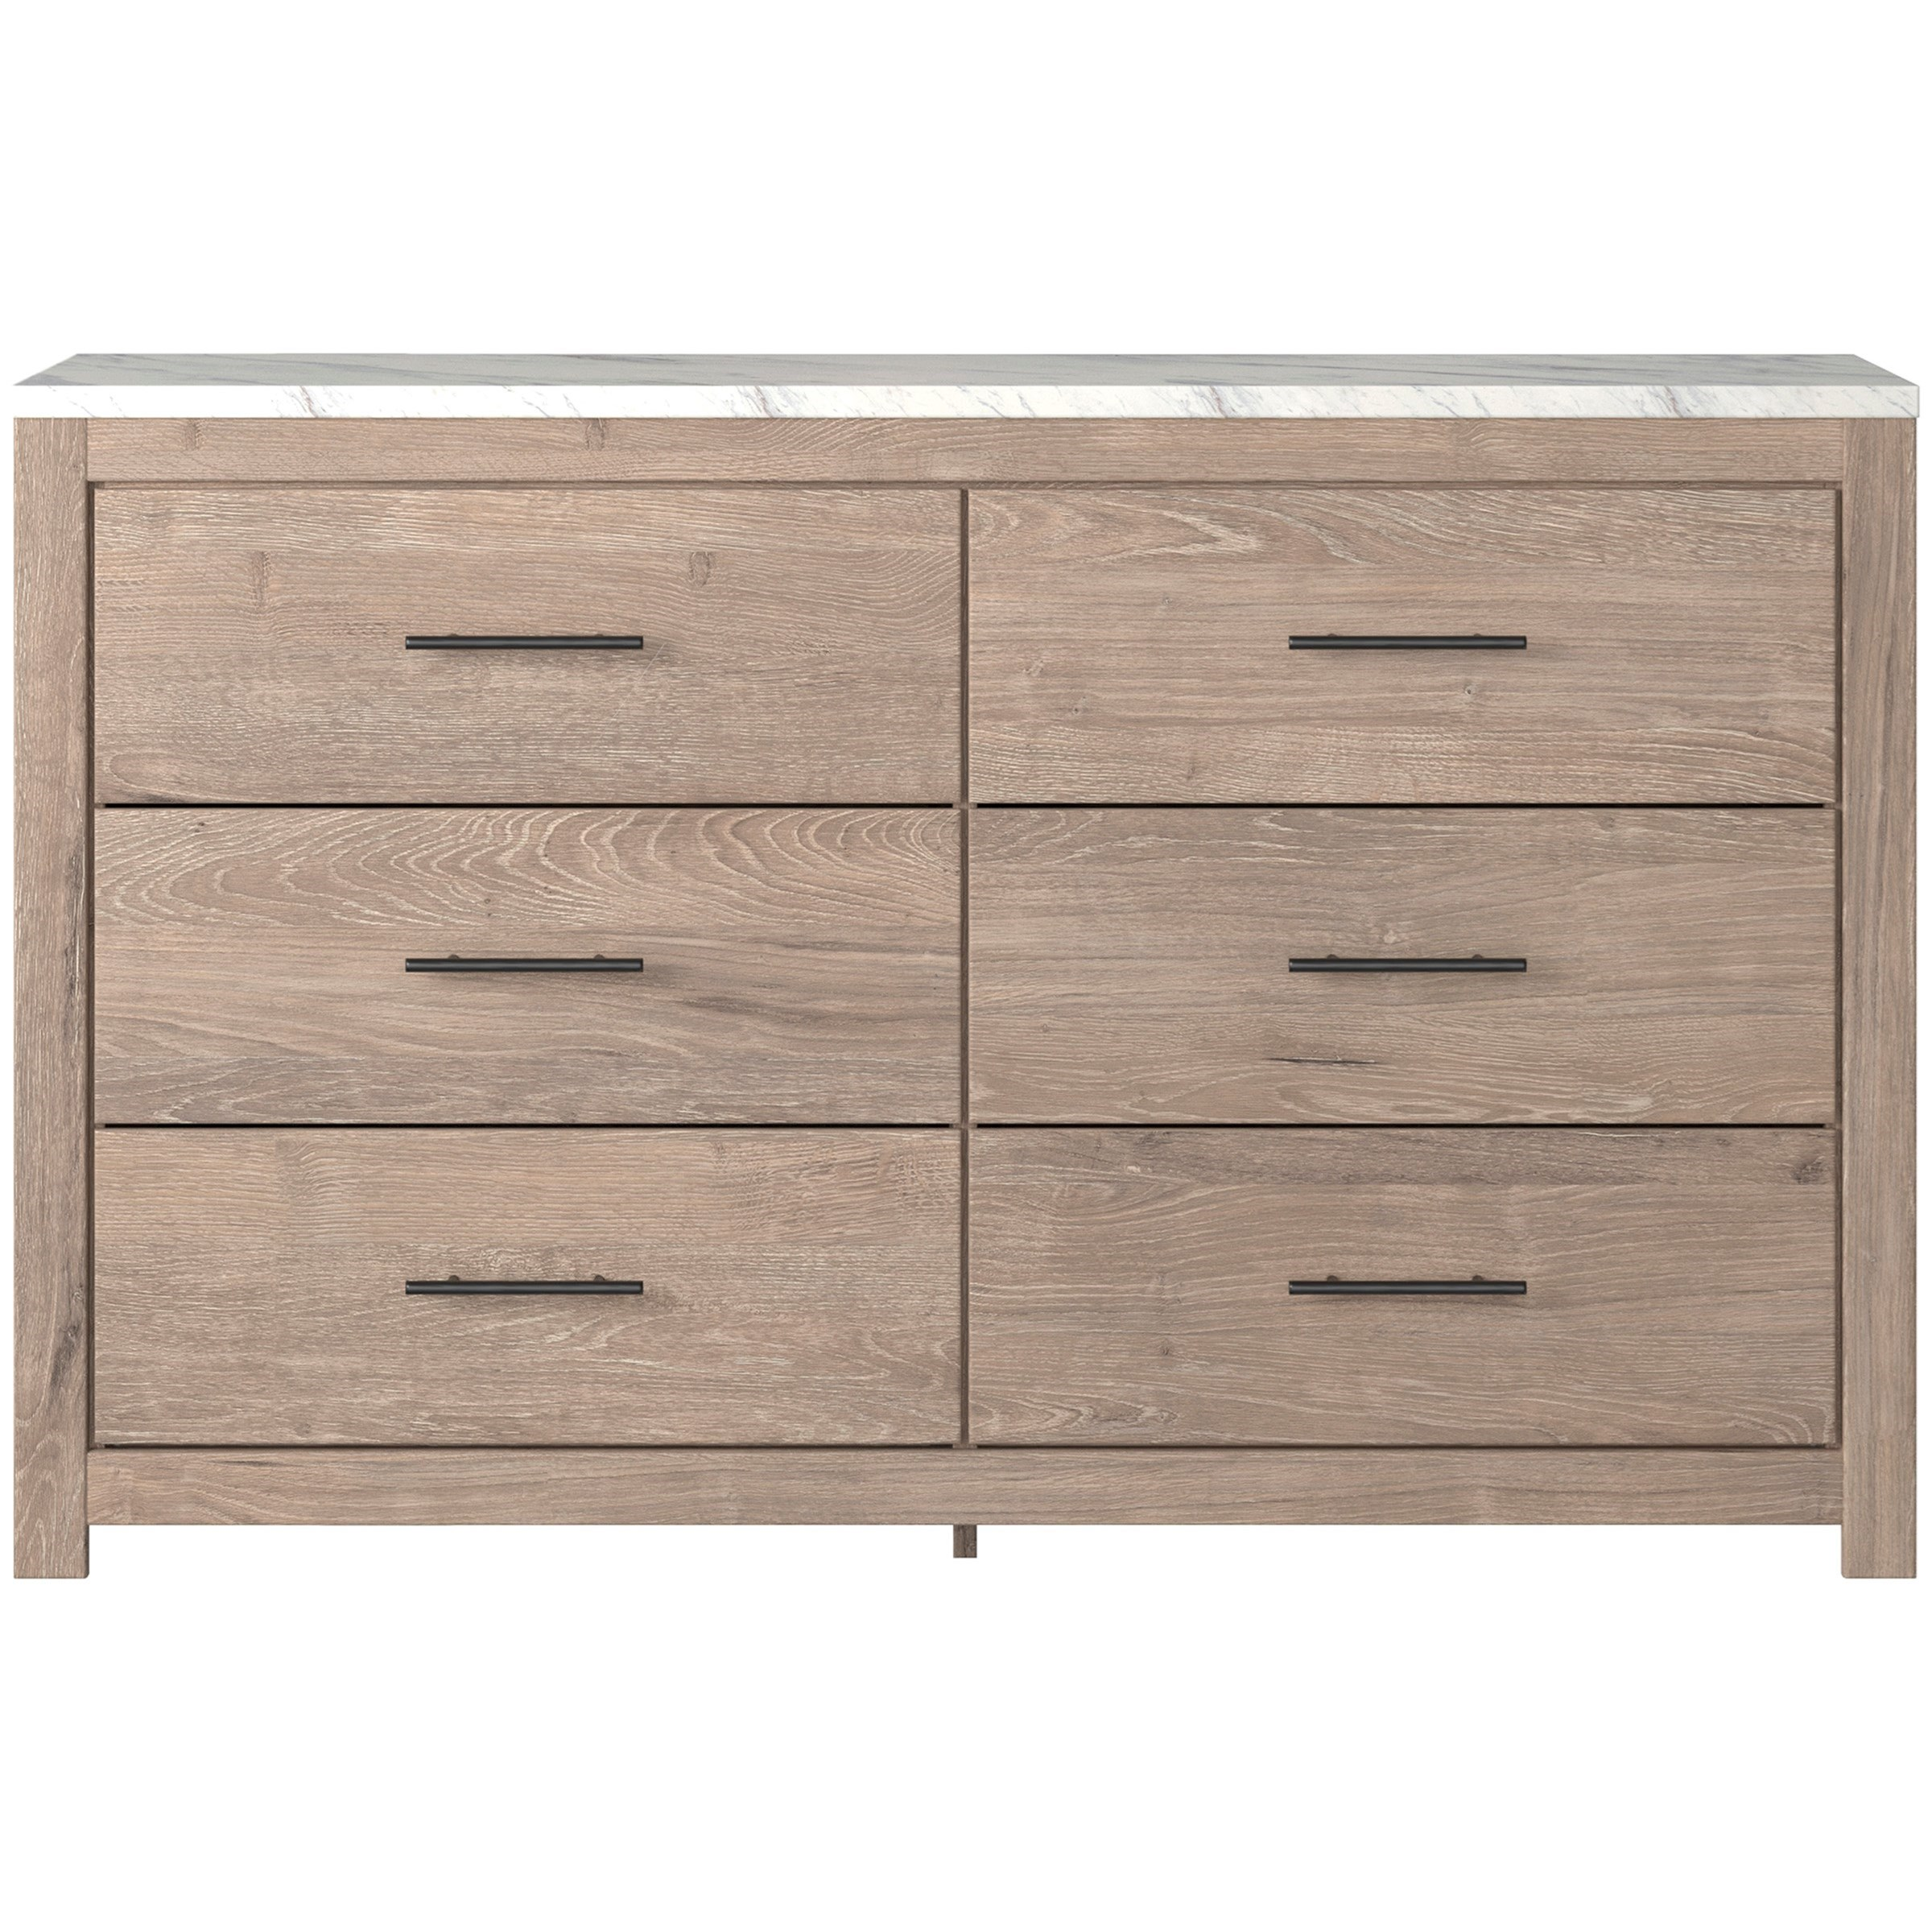 Senniberg Dresser by Signature Design by Ashley at Household Furniture